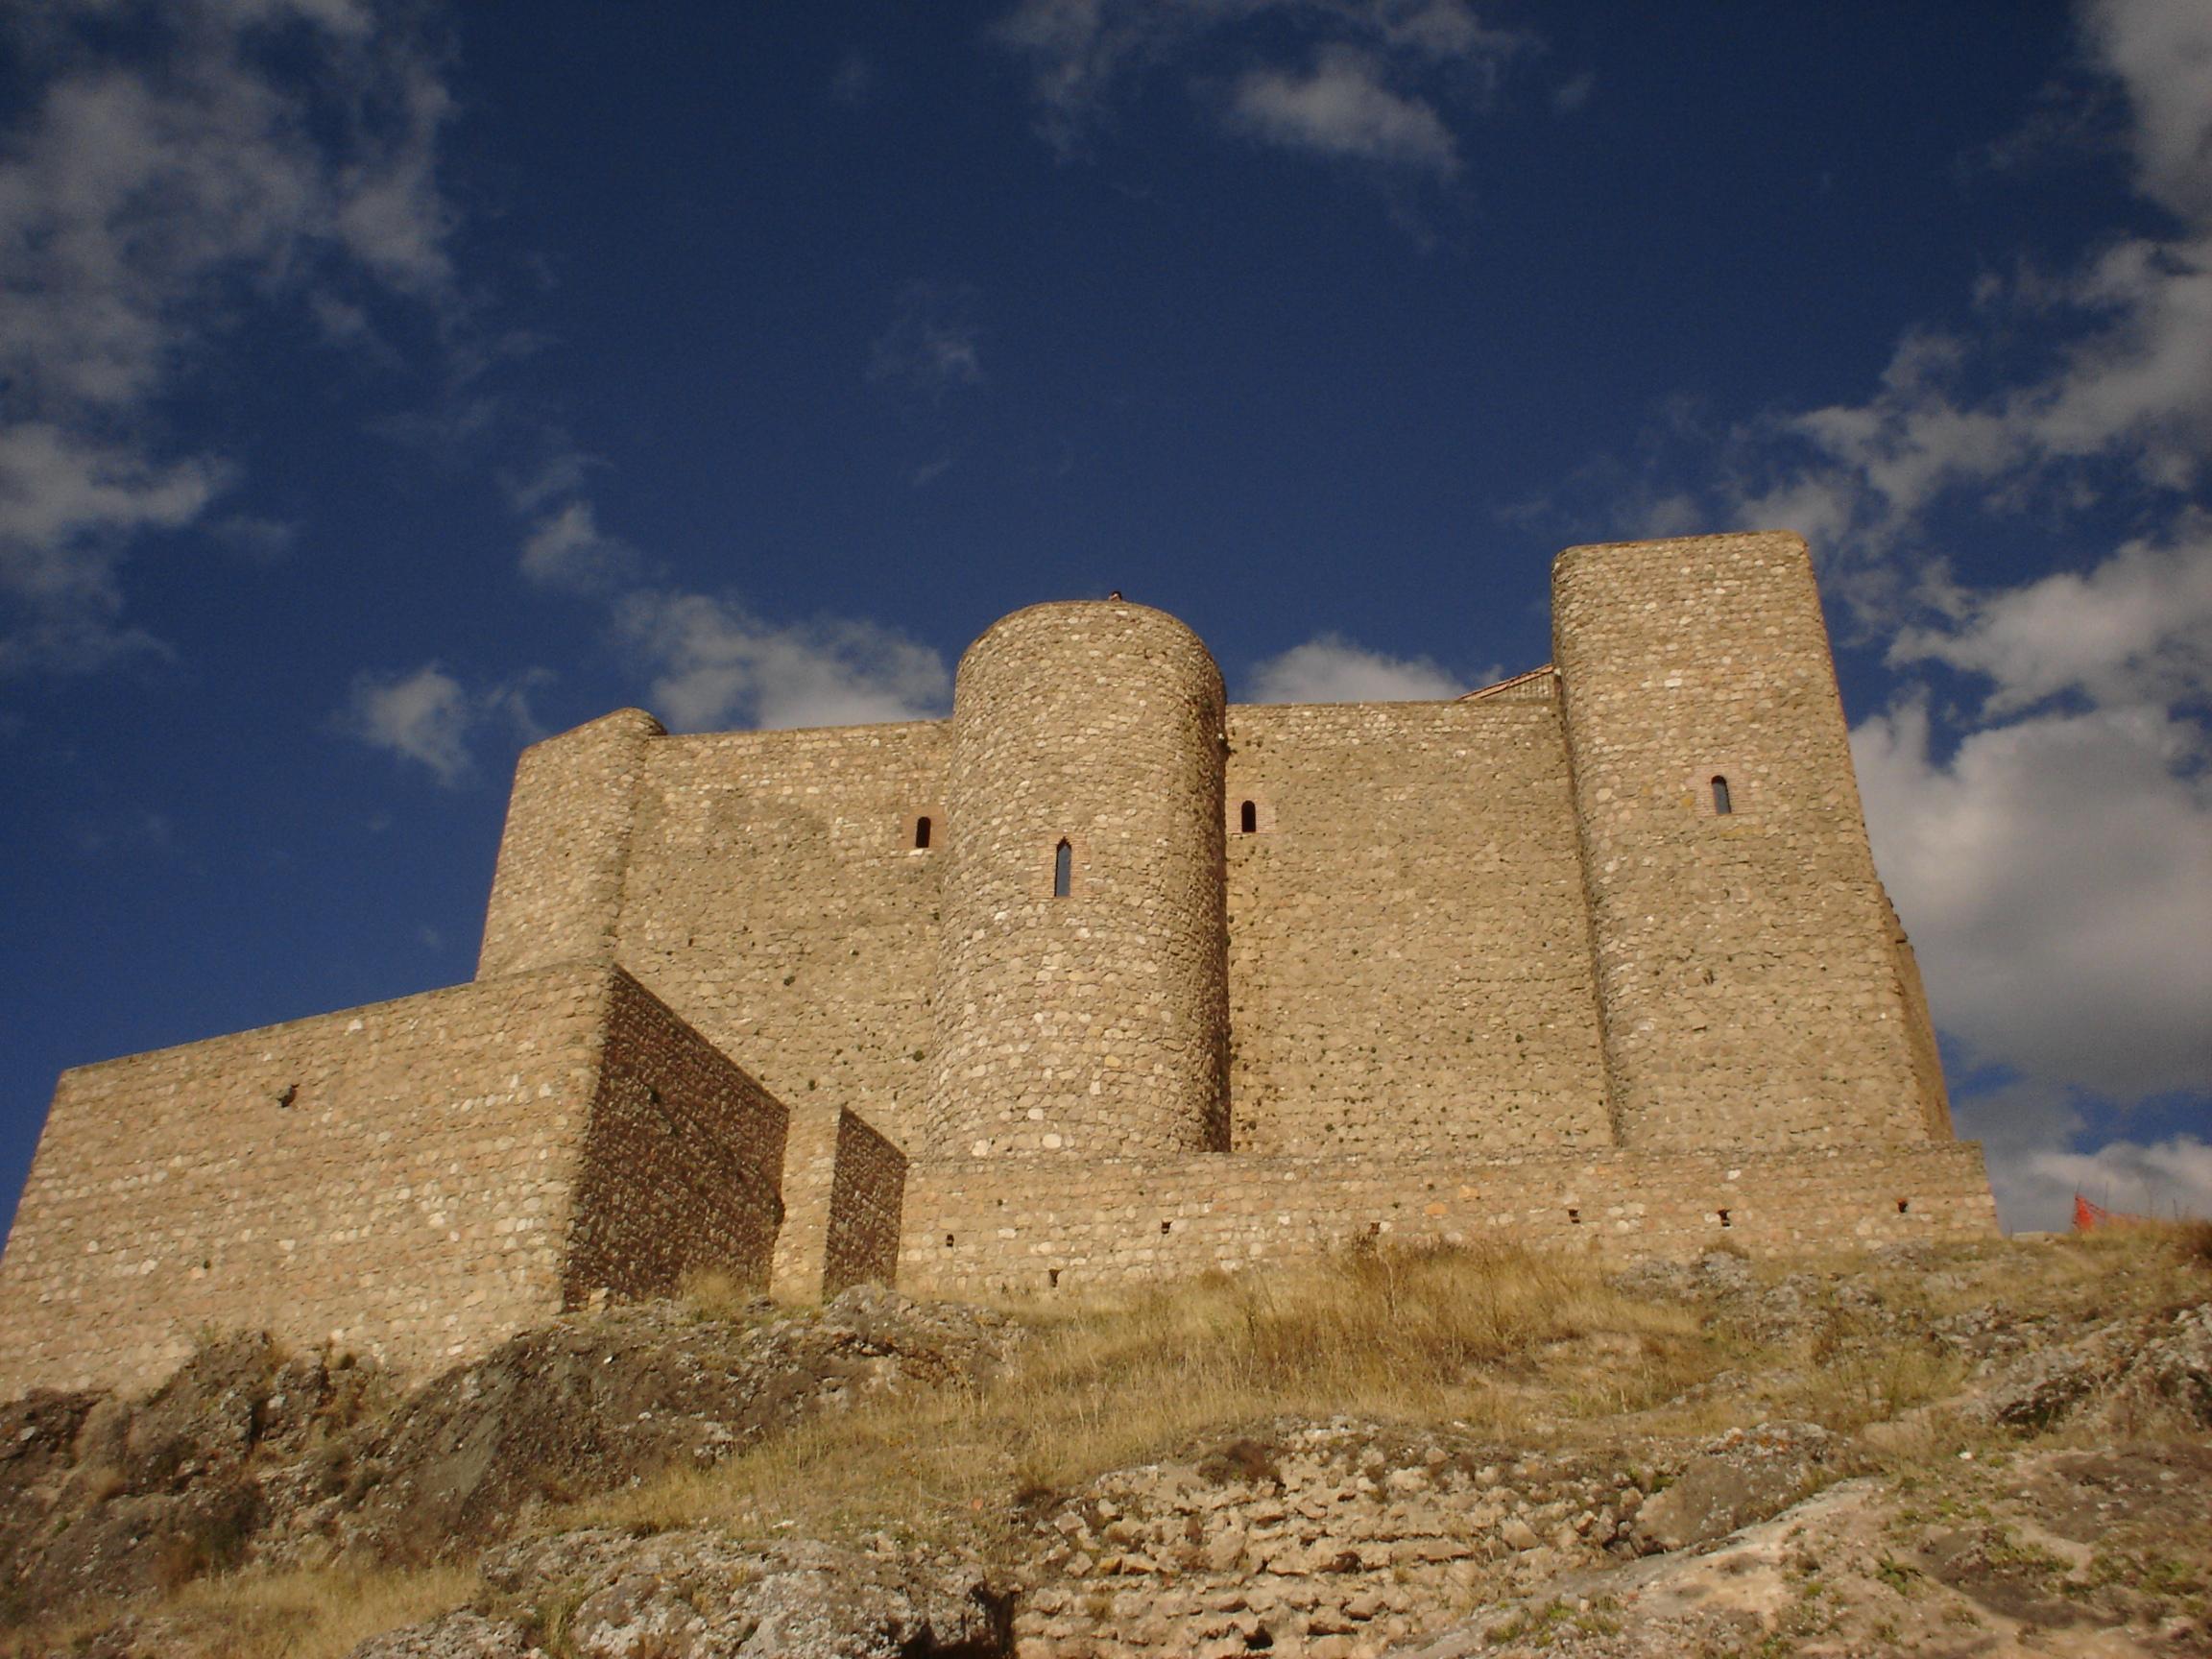 File:Castillo de Segura de la Sierra.jpg - Wikimedia Commons